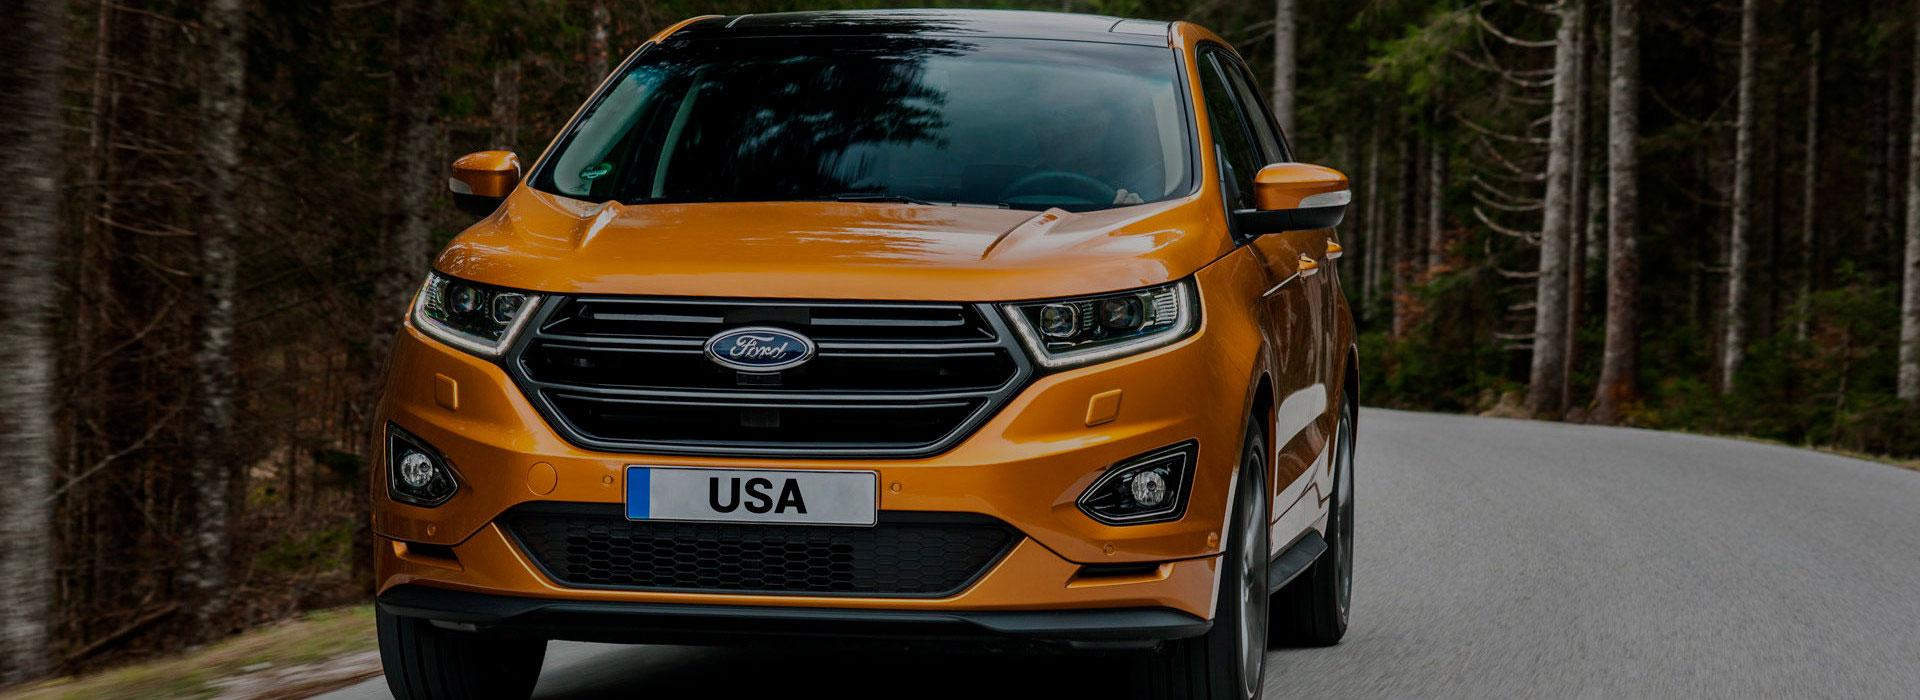 <span>Авто из США</span> в Днепре и Украине - Бу Машины с Аукционов Америки<span>Копарт, Манхейм, IAAI</span>